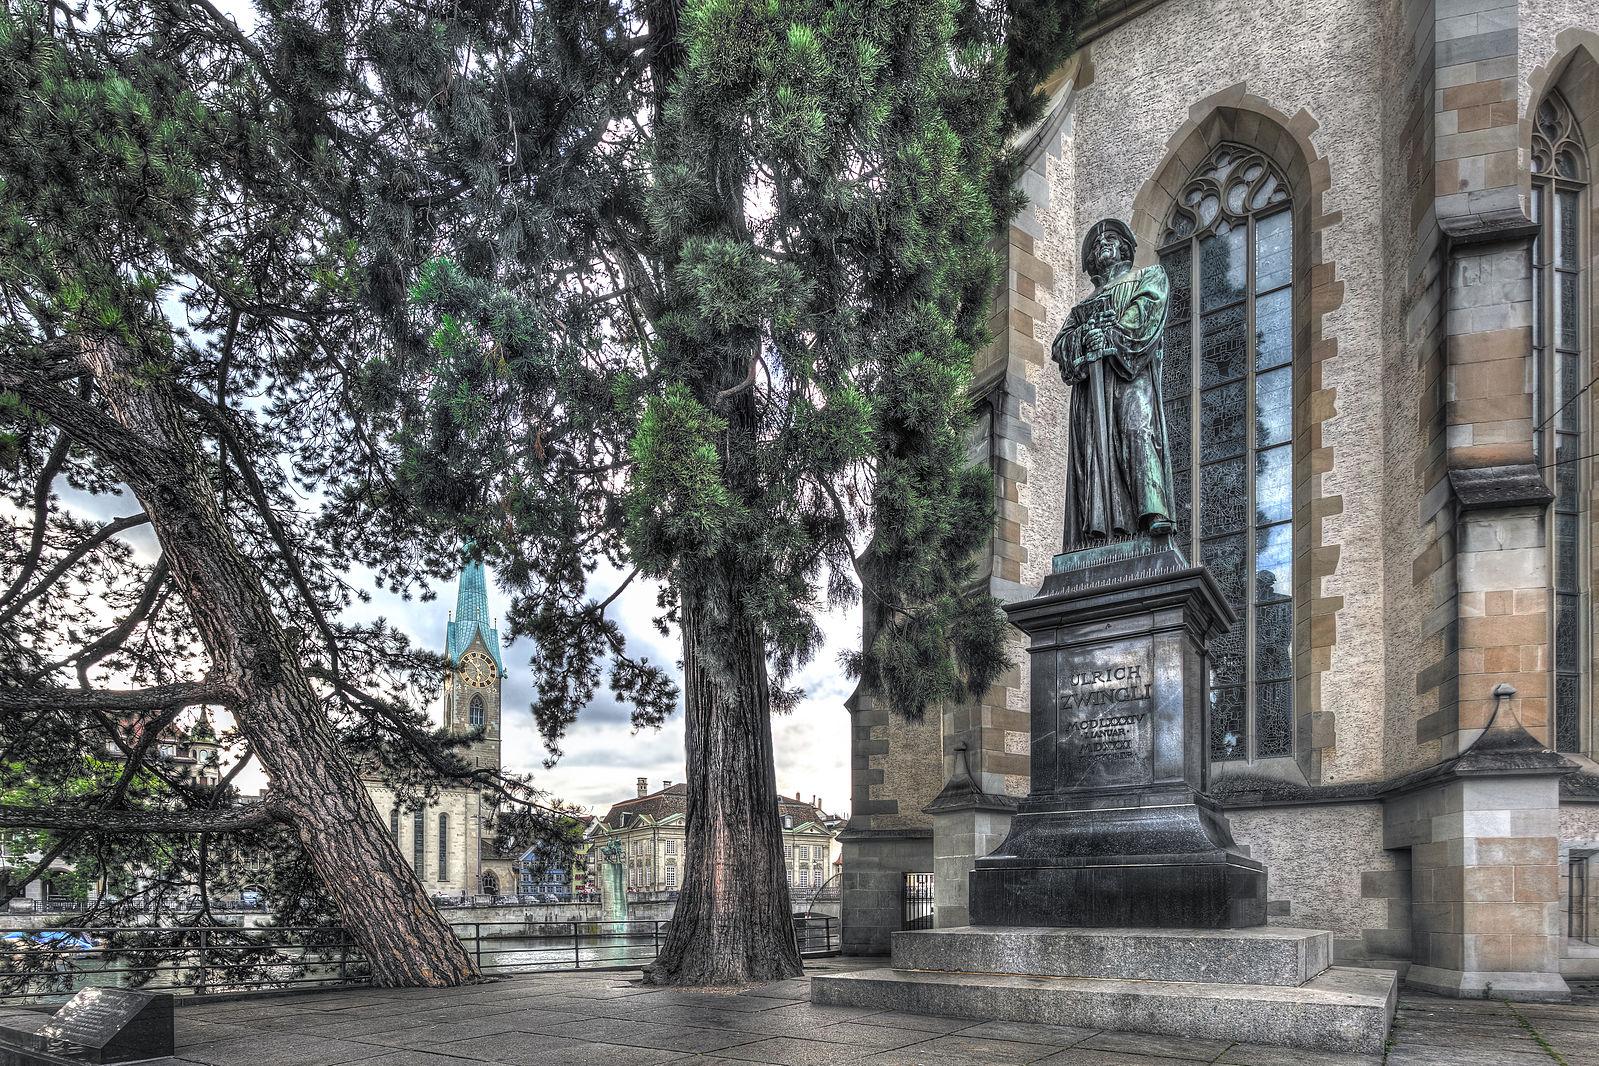 Zwingli in Zurich